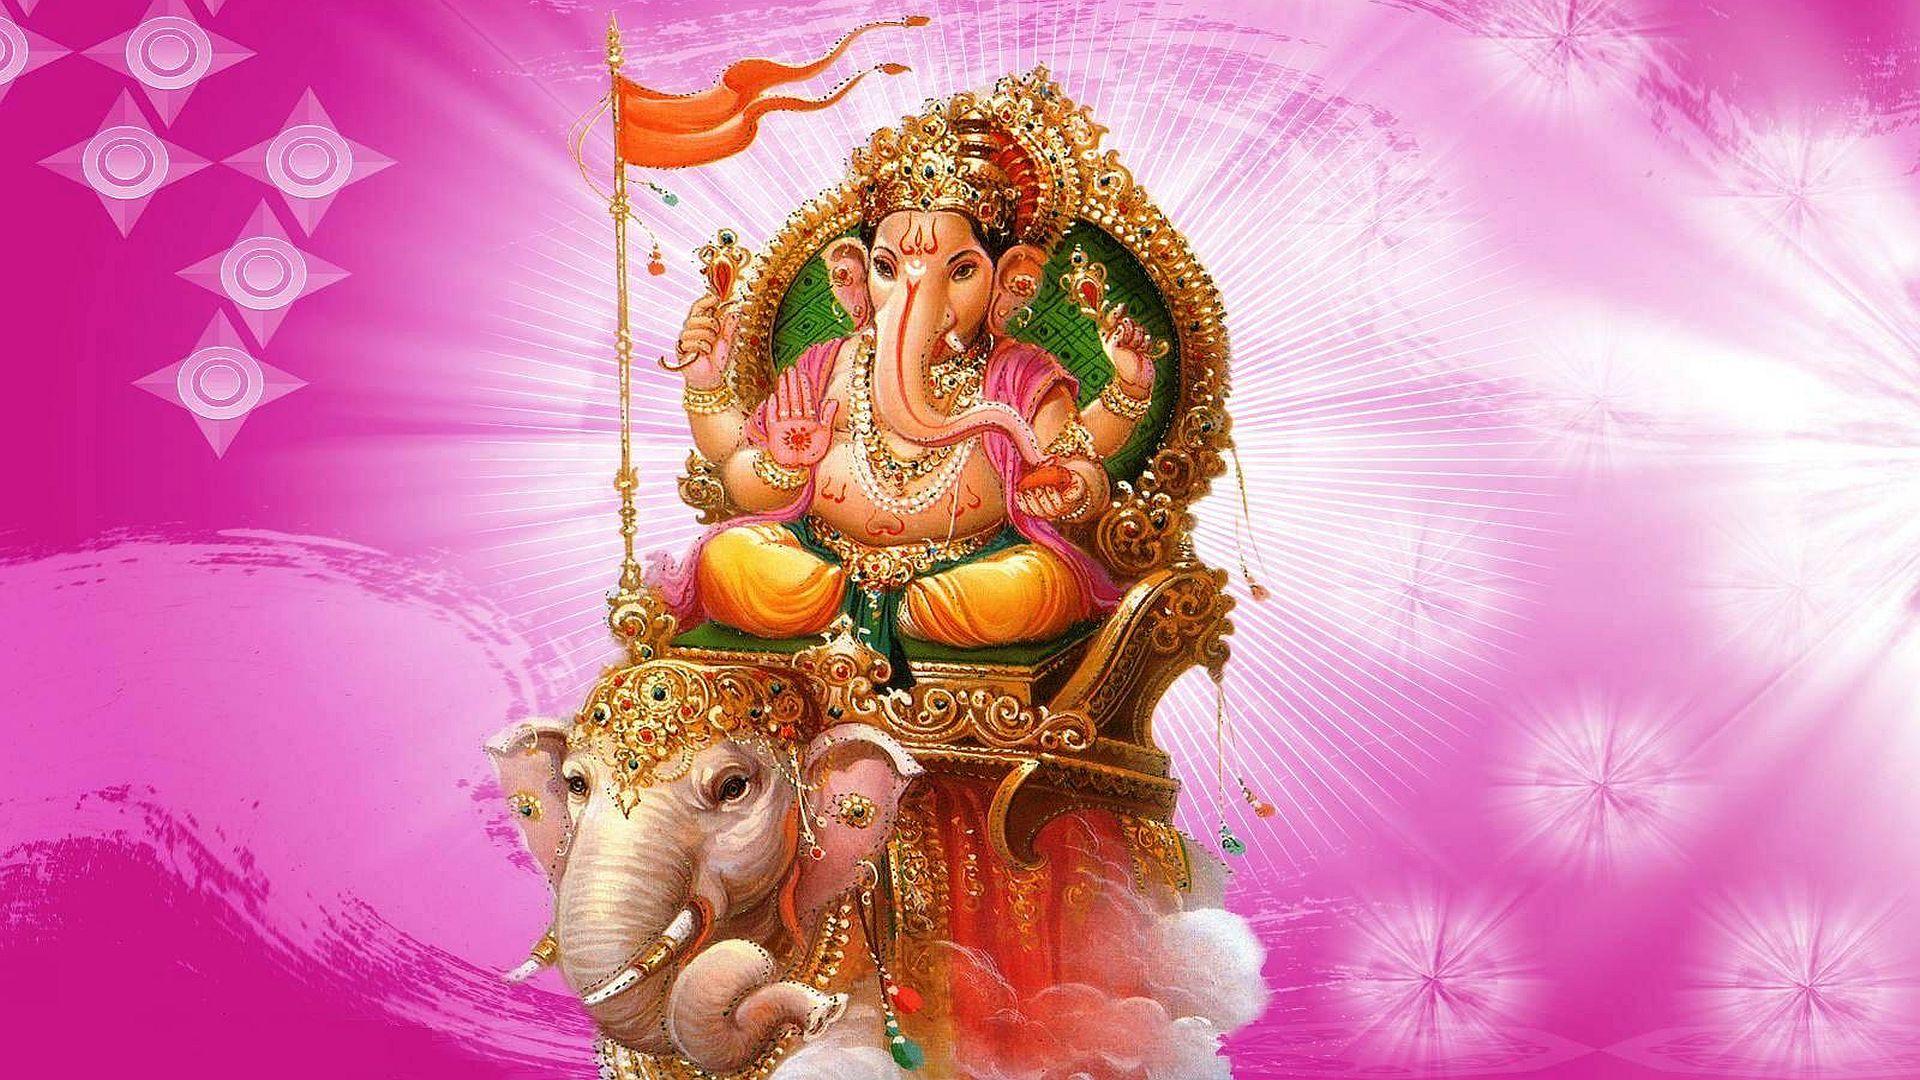 Lord Ganesha 3d Wallpapers Free Download Lord Ganesha God Hd Wallpapers